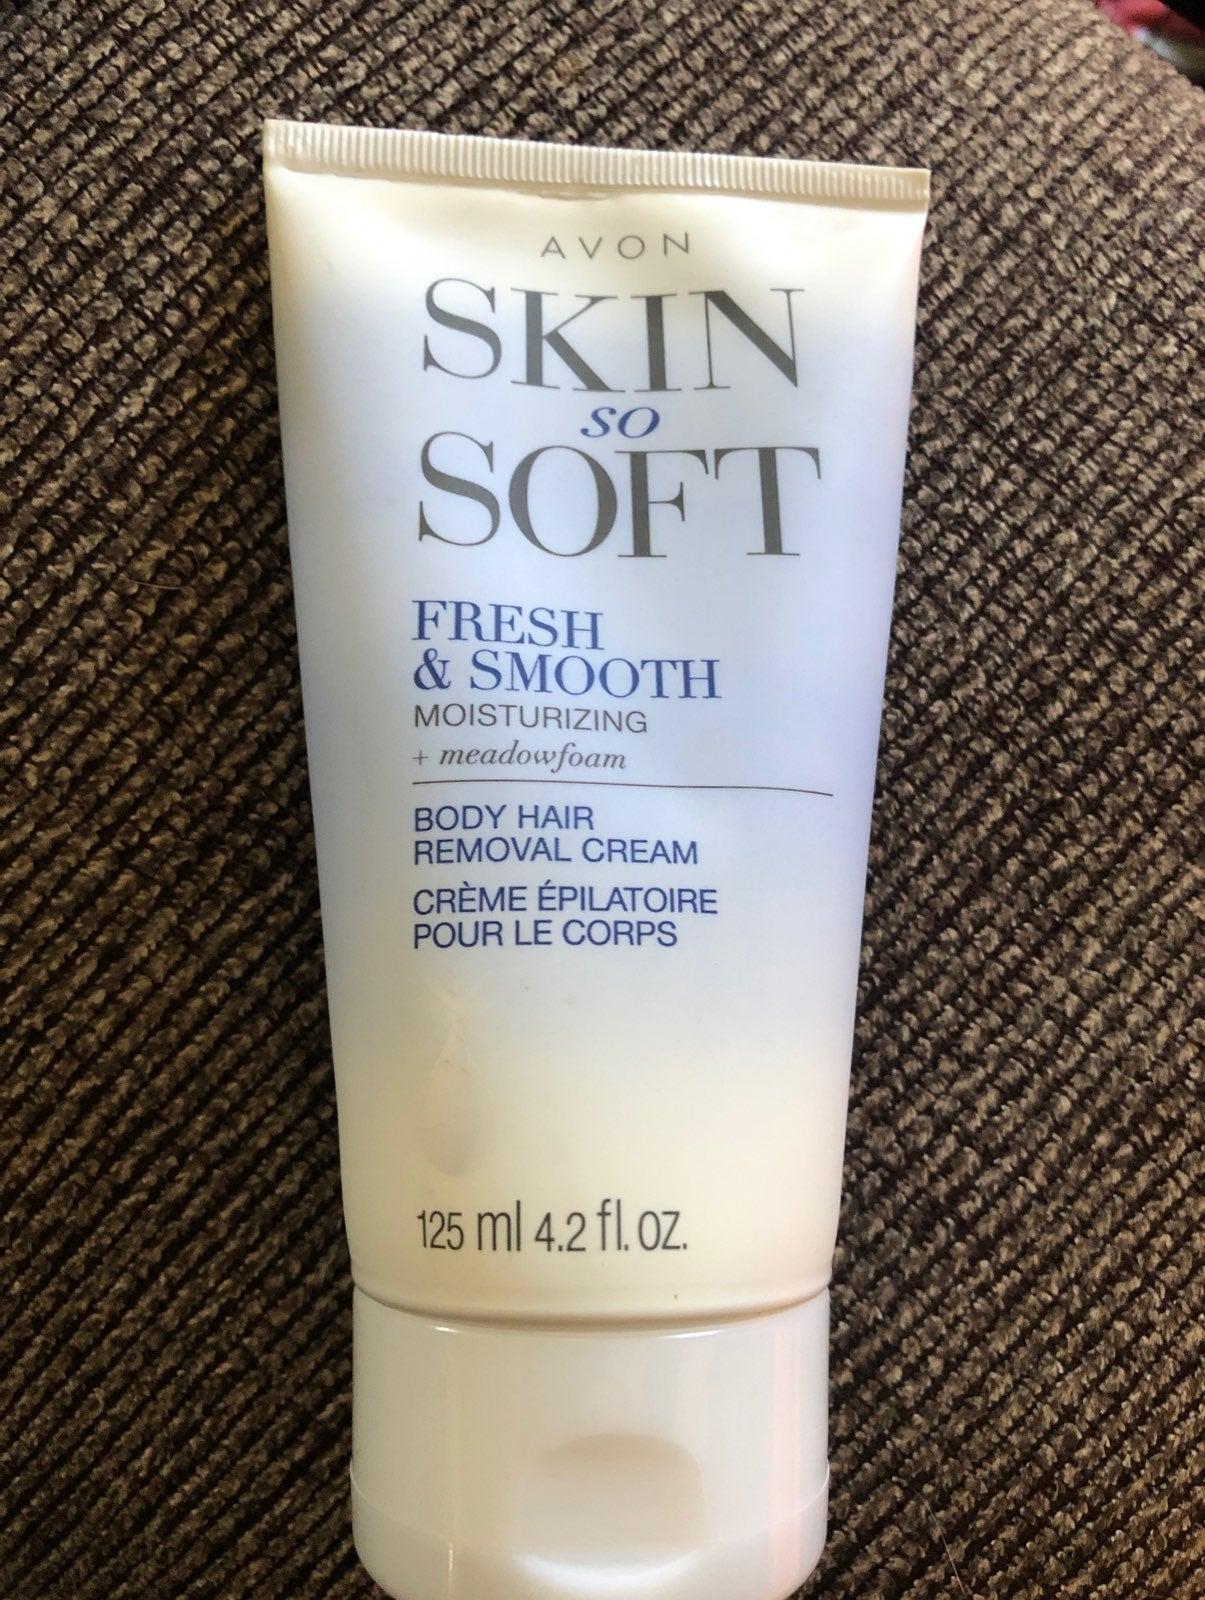 Avon Skin so Soft body hair removal crea